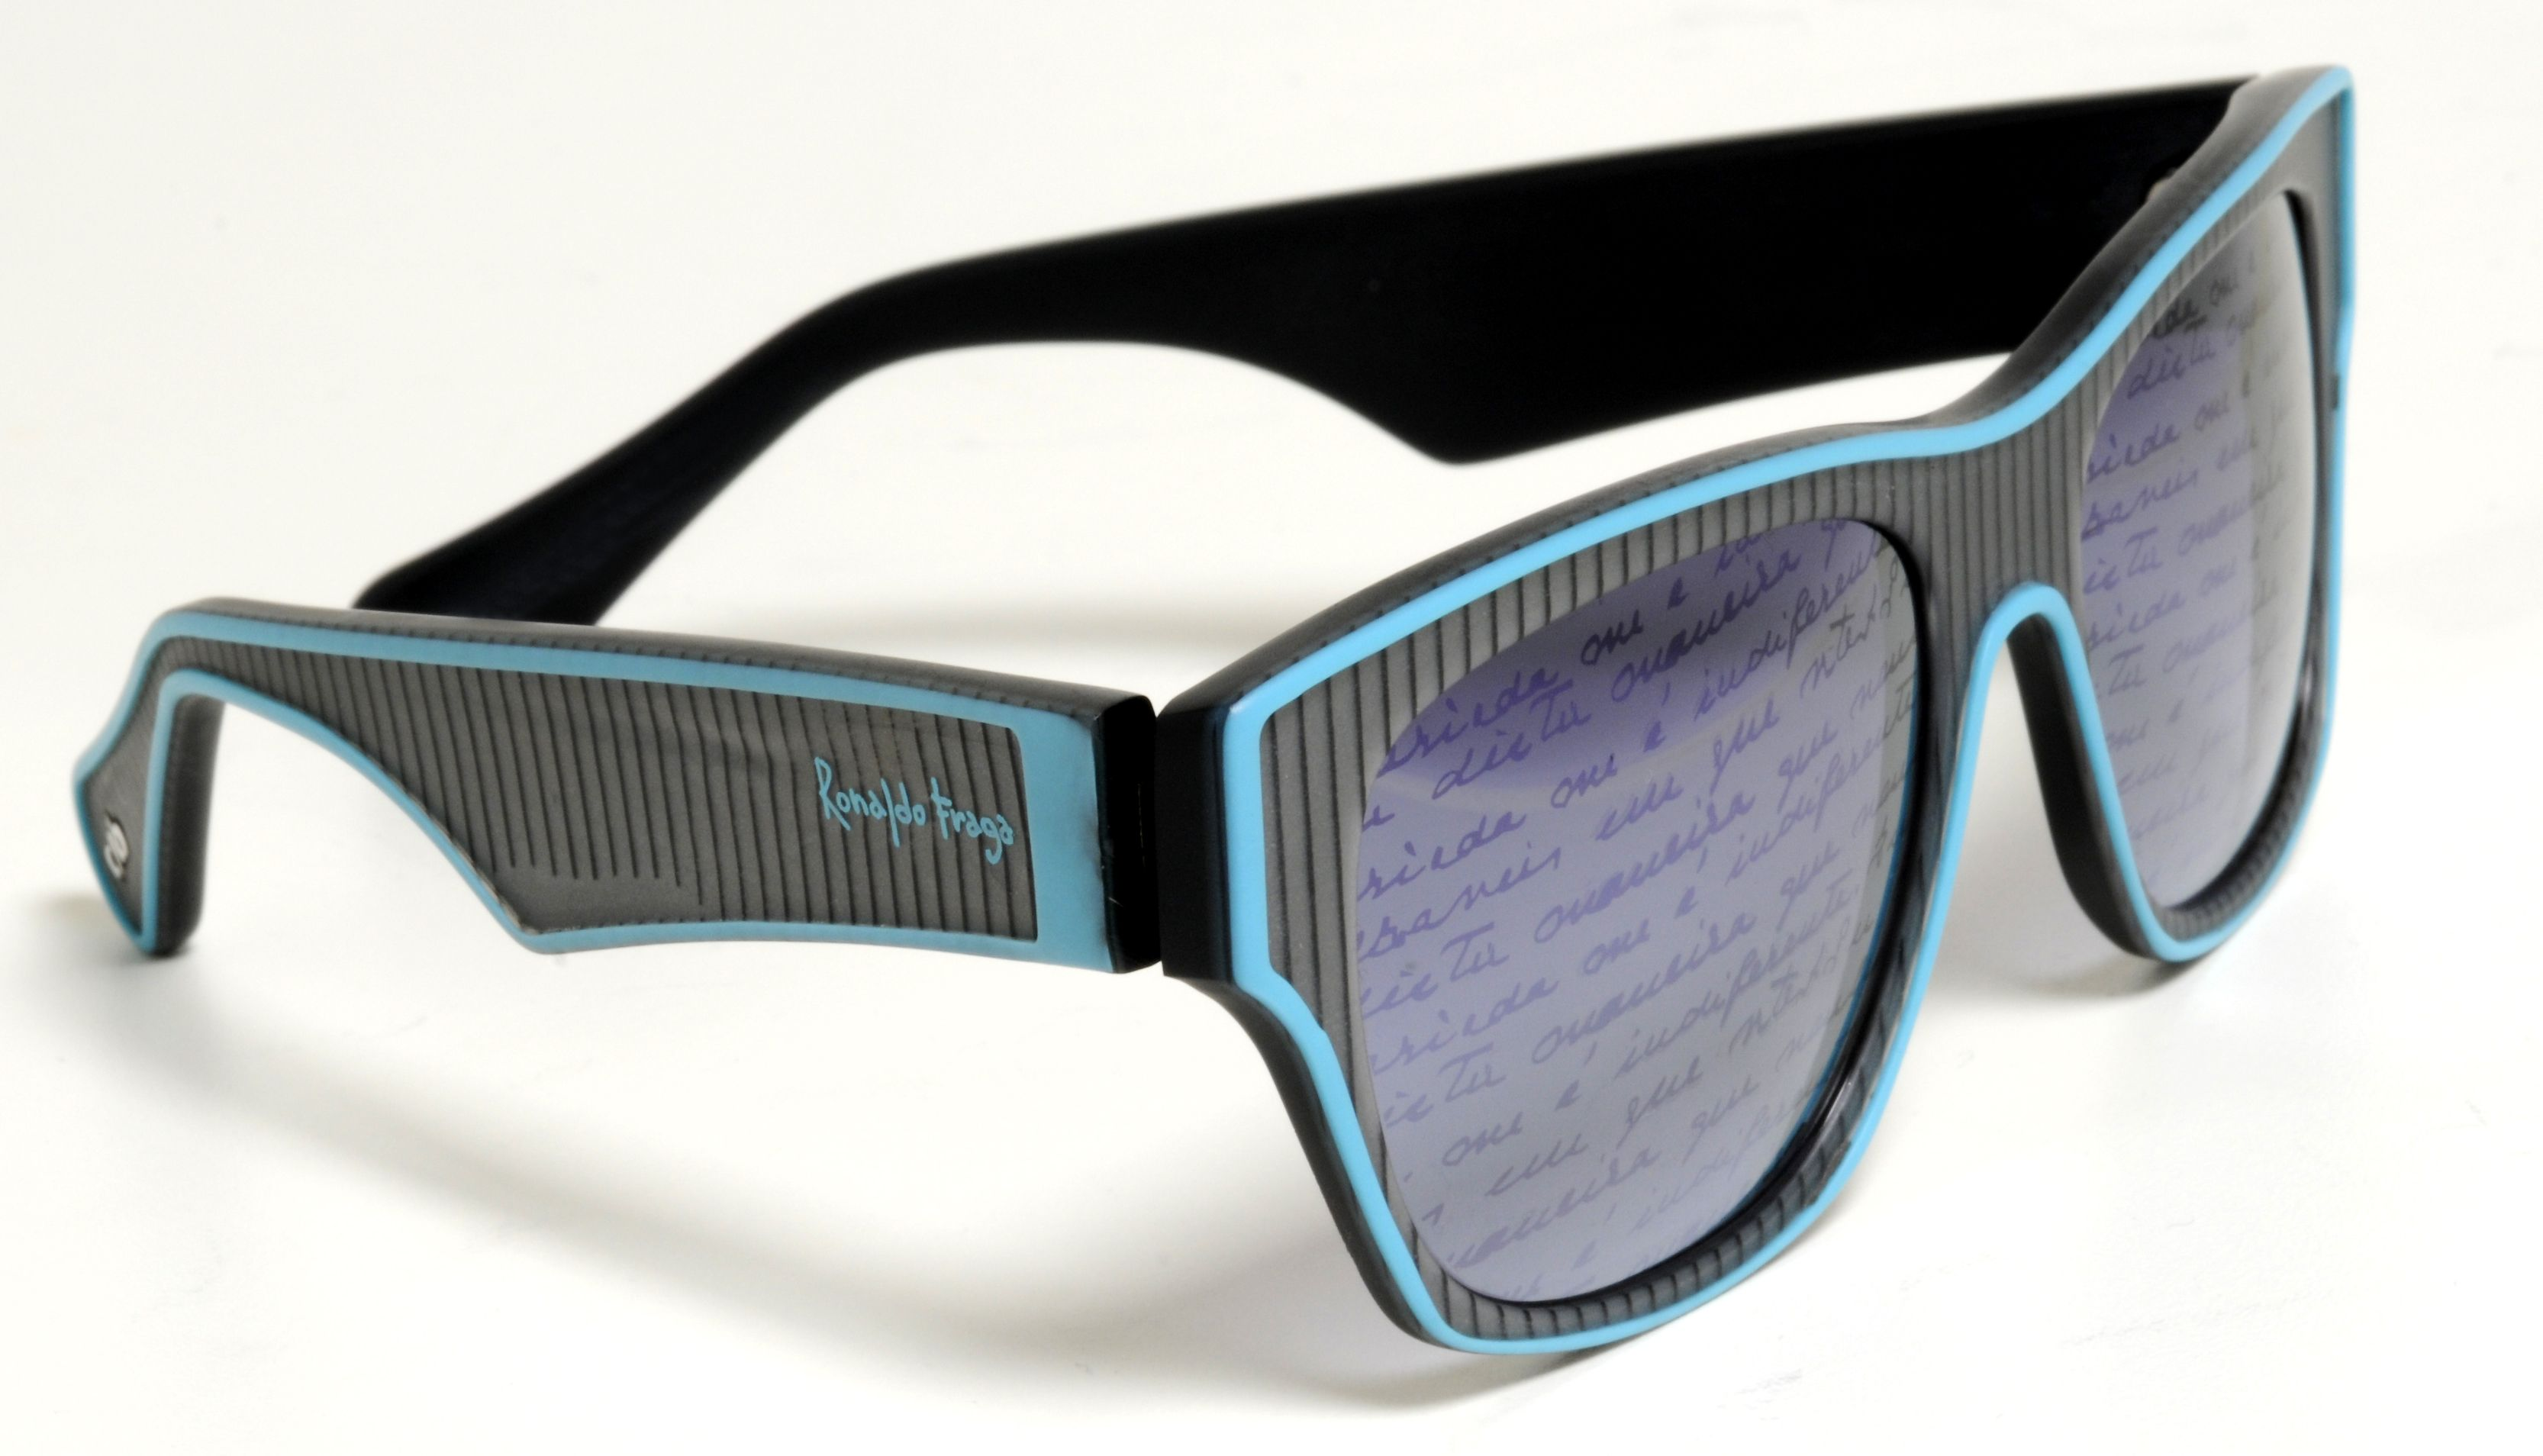 eec715d60 Chilli Beans por Ronaldo Fraga   Quatro Olhos   Eyewear, Glasses e ...